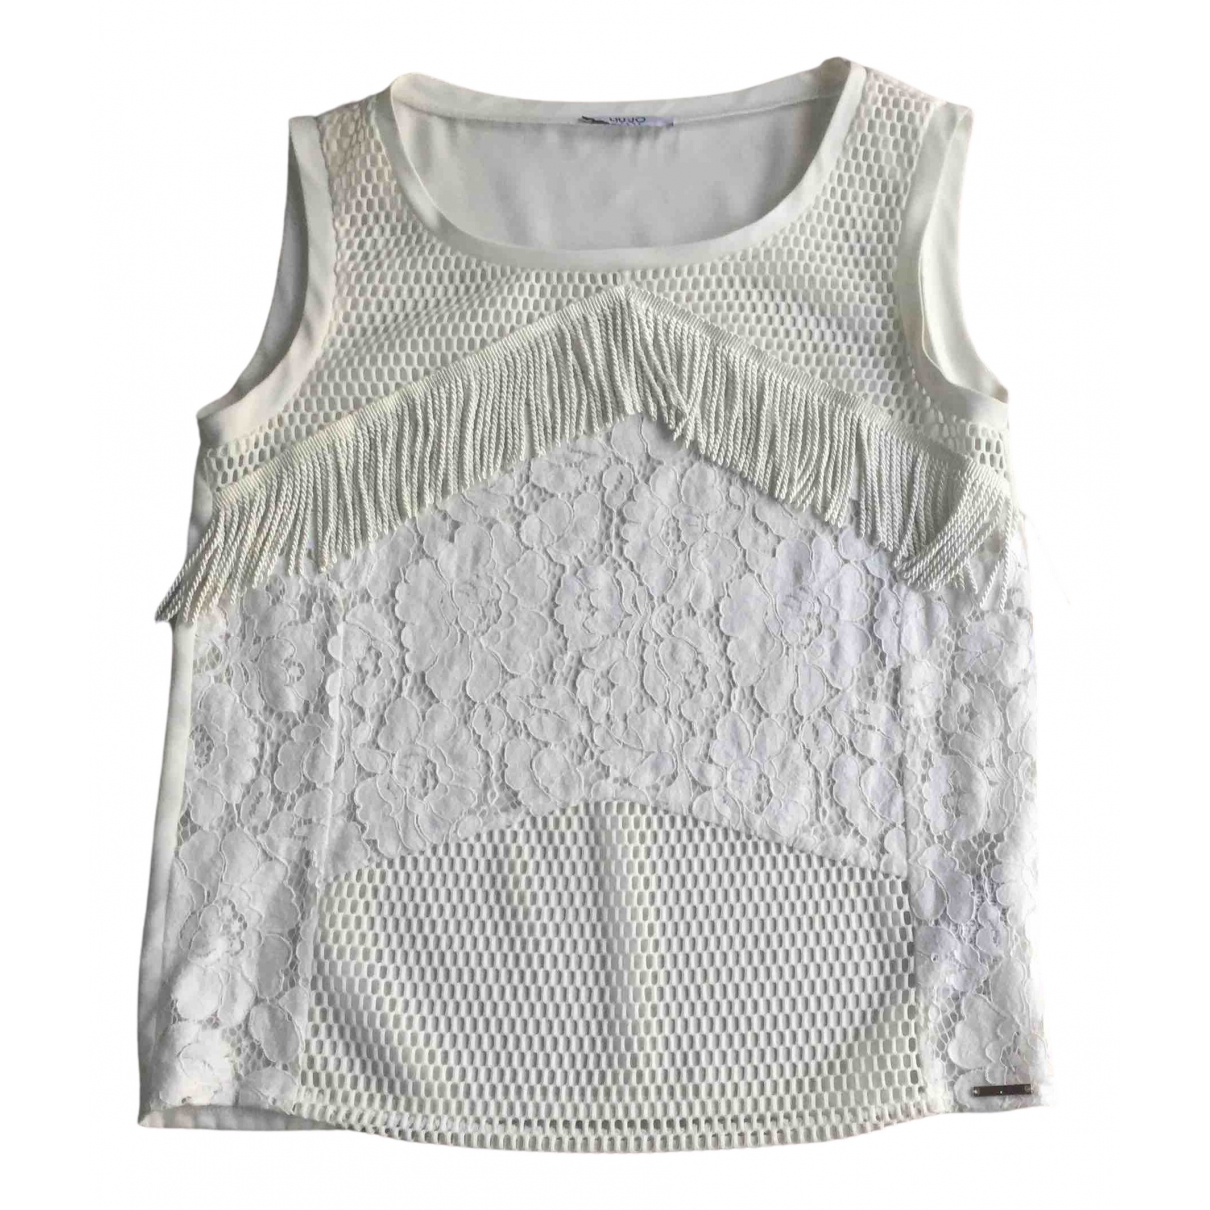 Liu.jo - Top   pour femme en dentelle - blanc